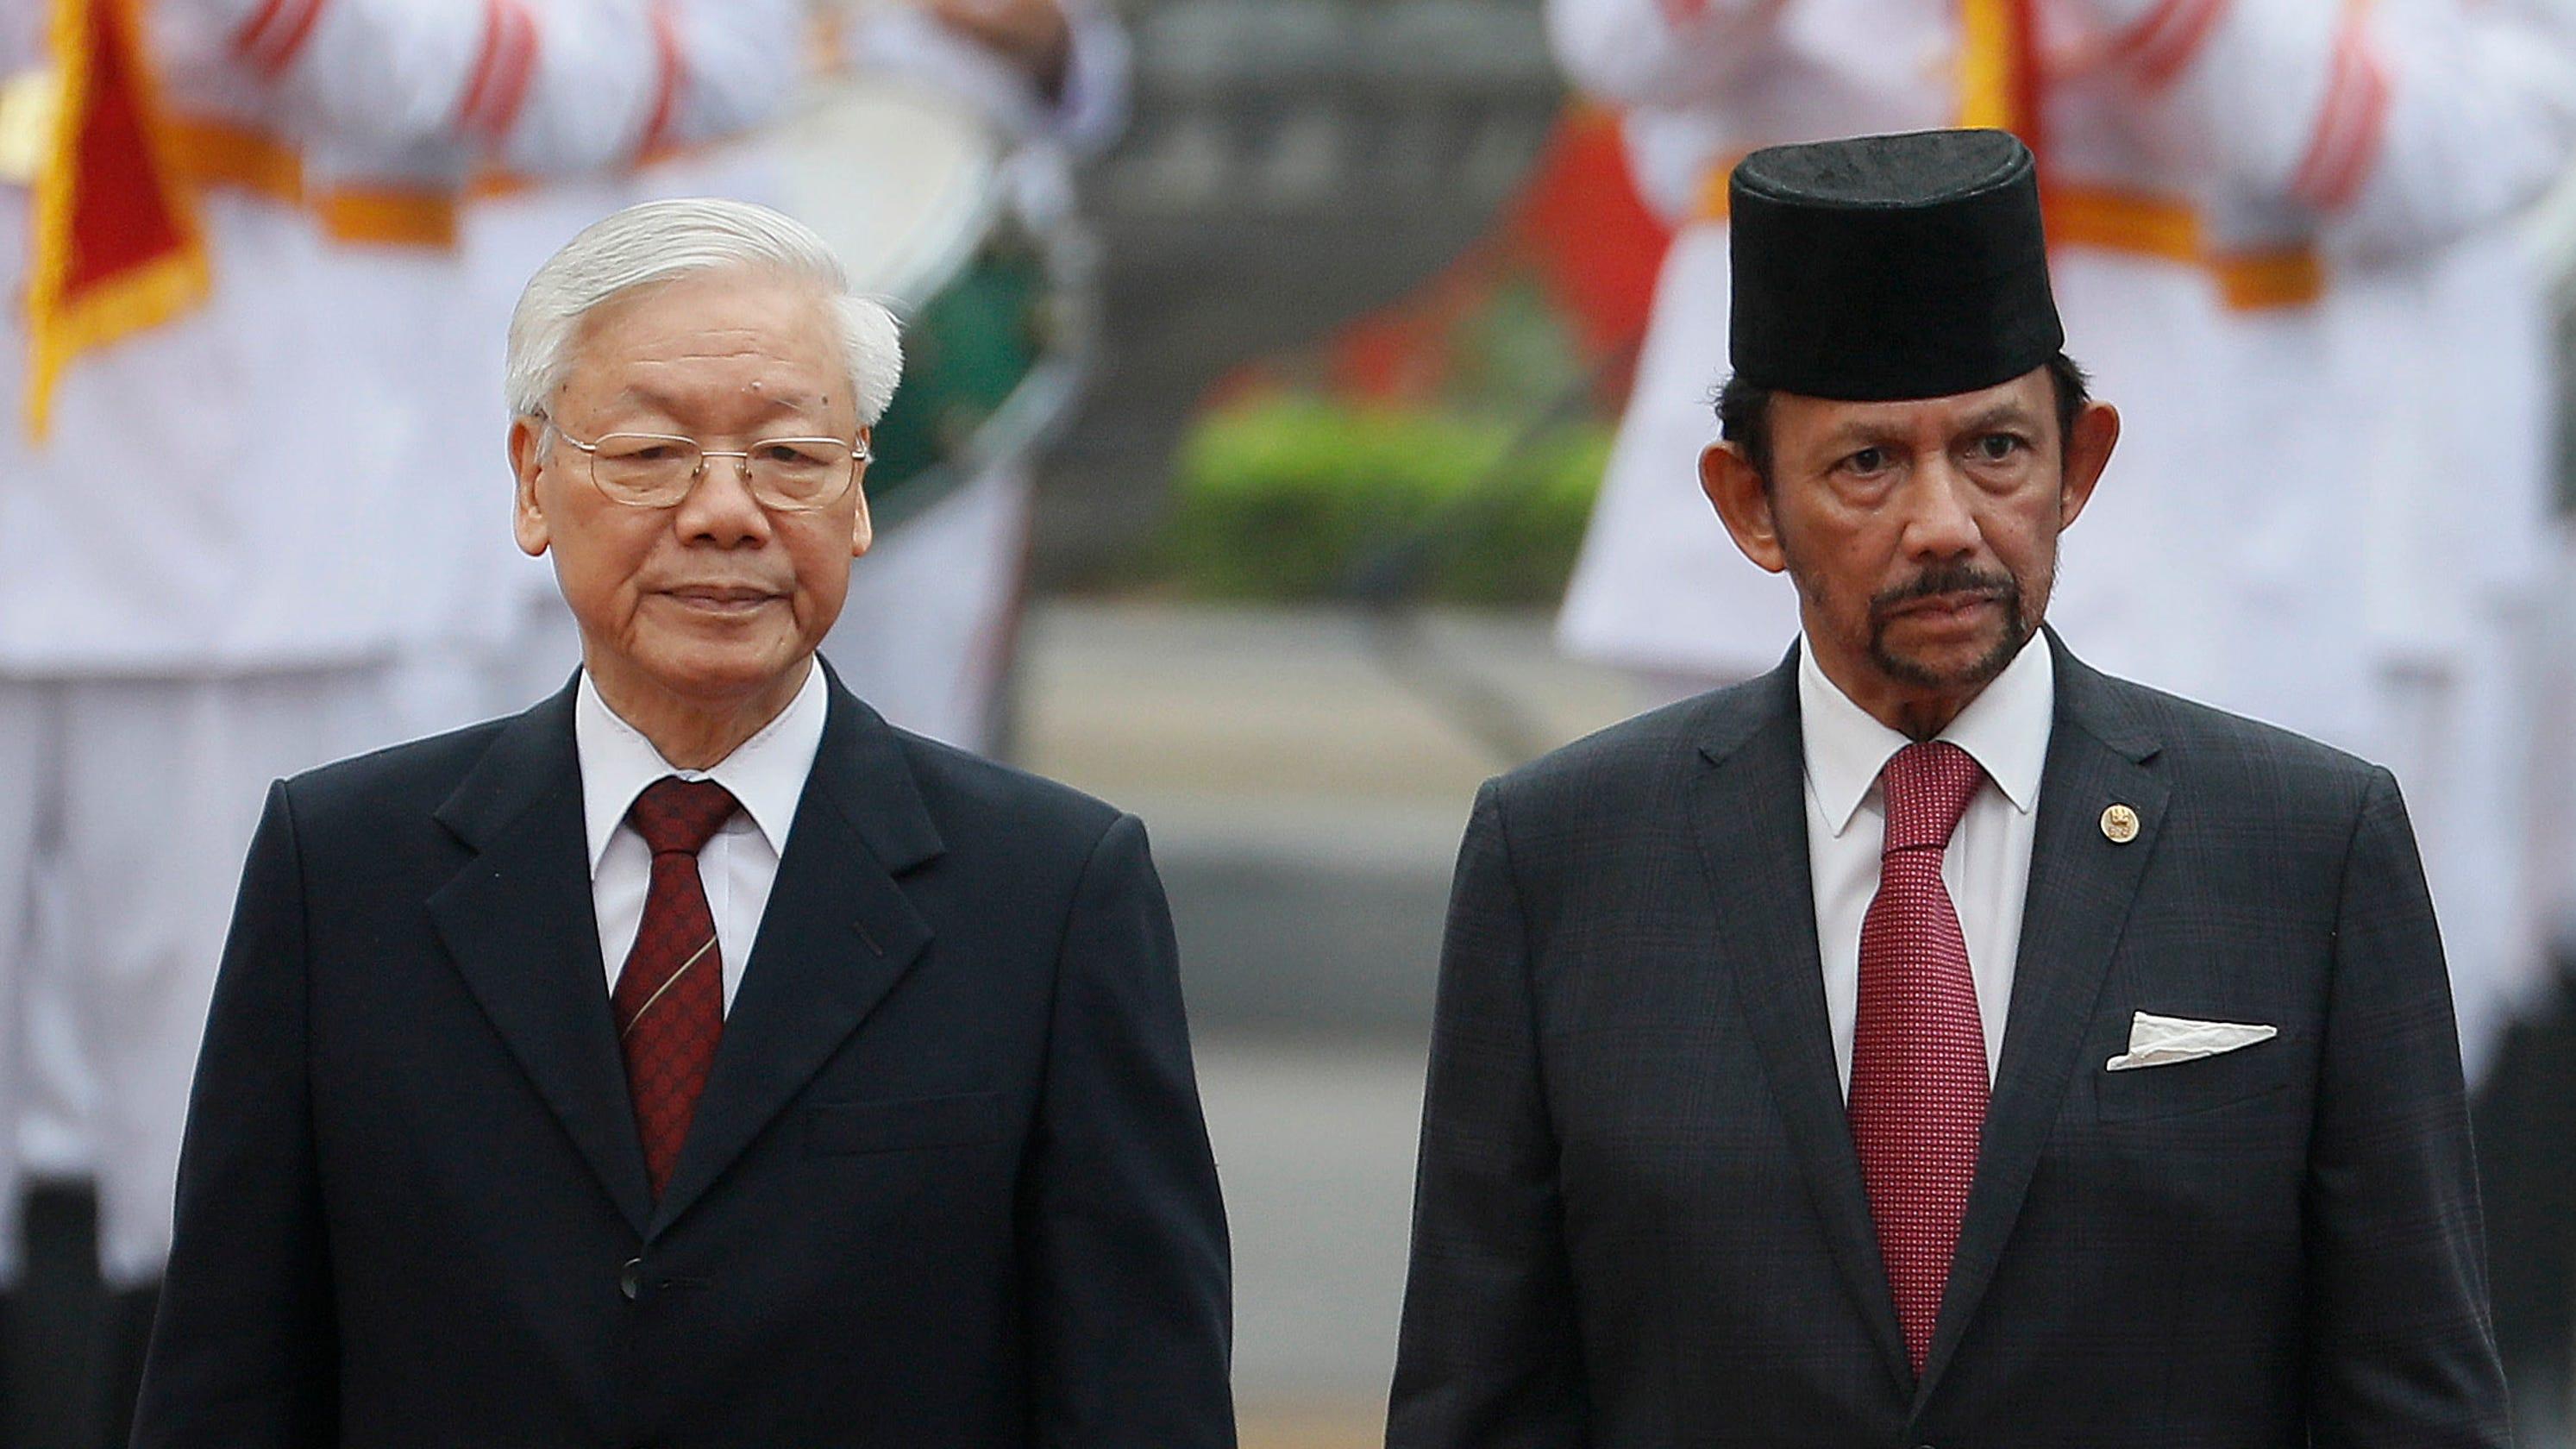 Brunei boycott: Travel groups, celebrities over gay sex law